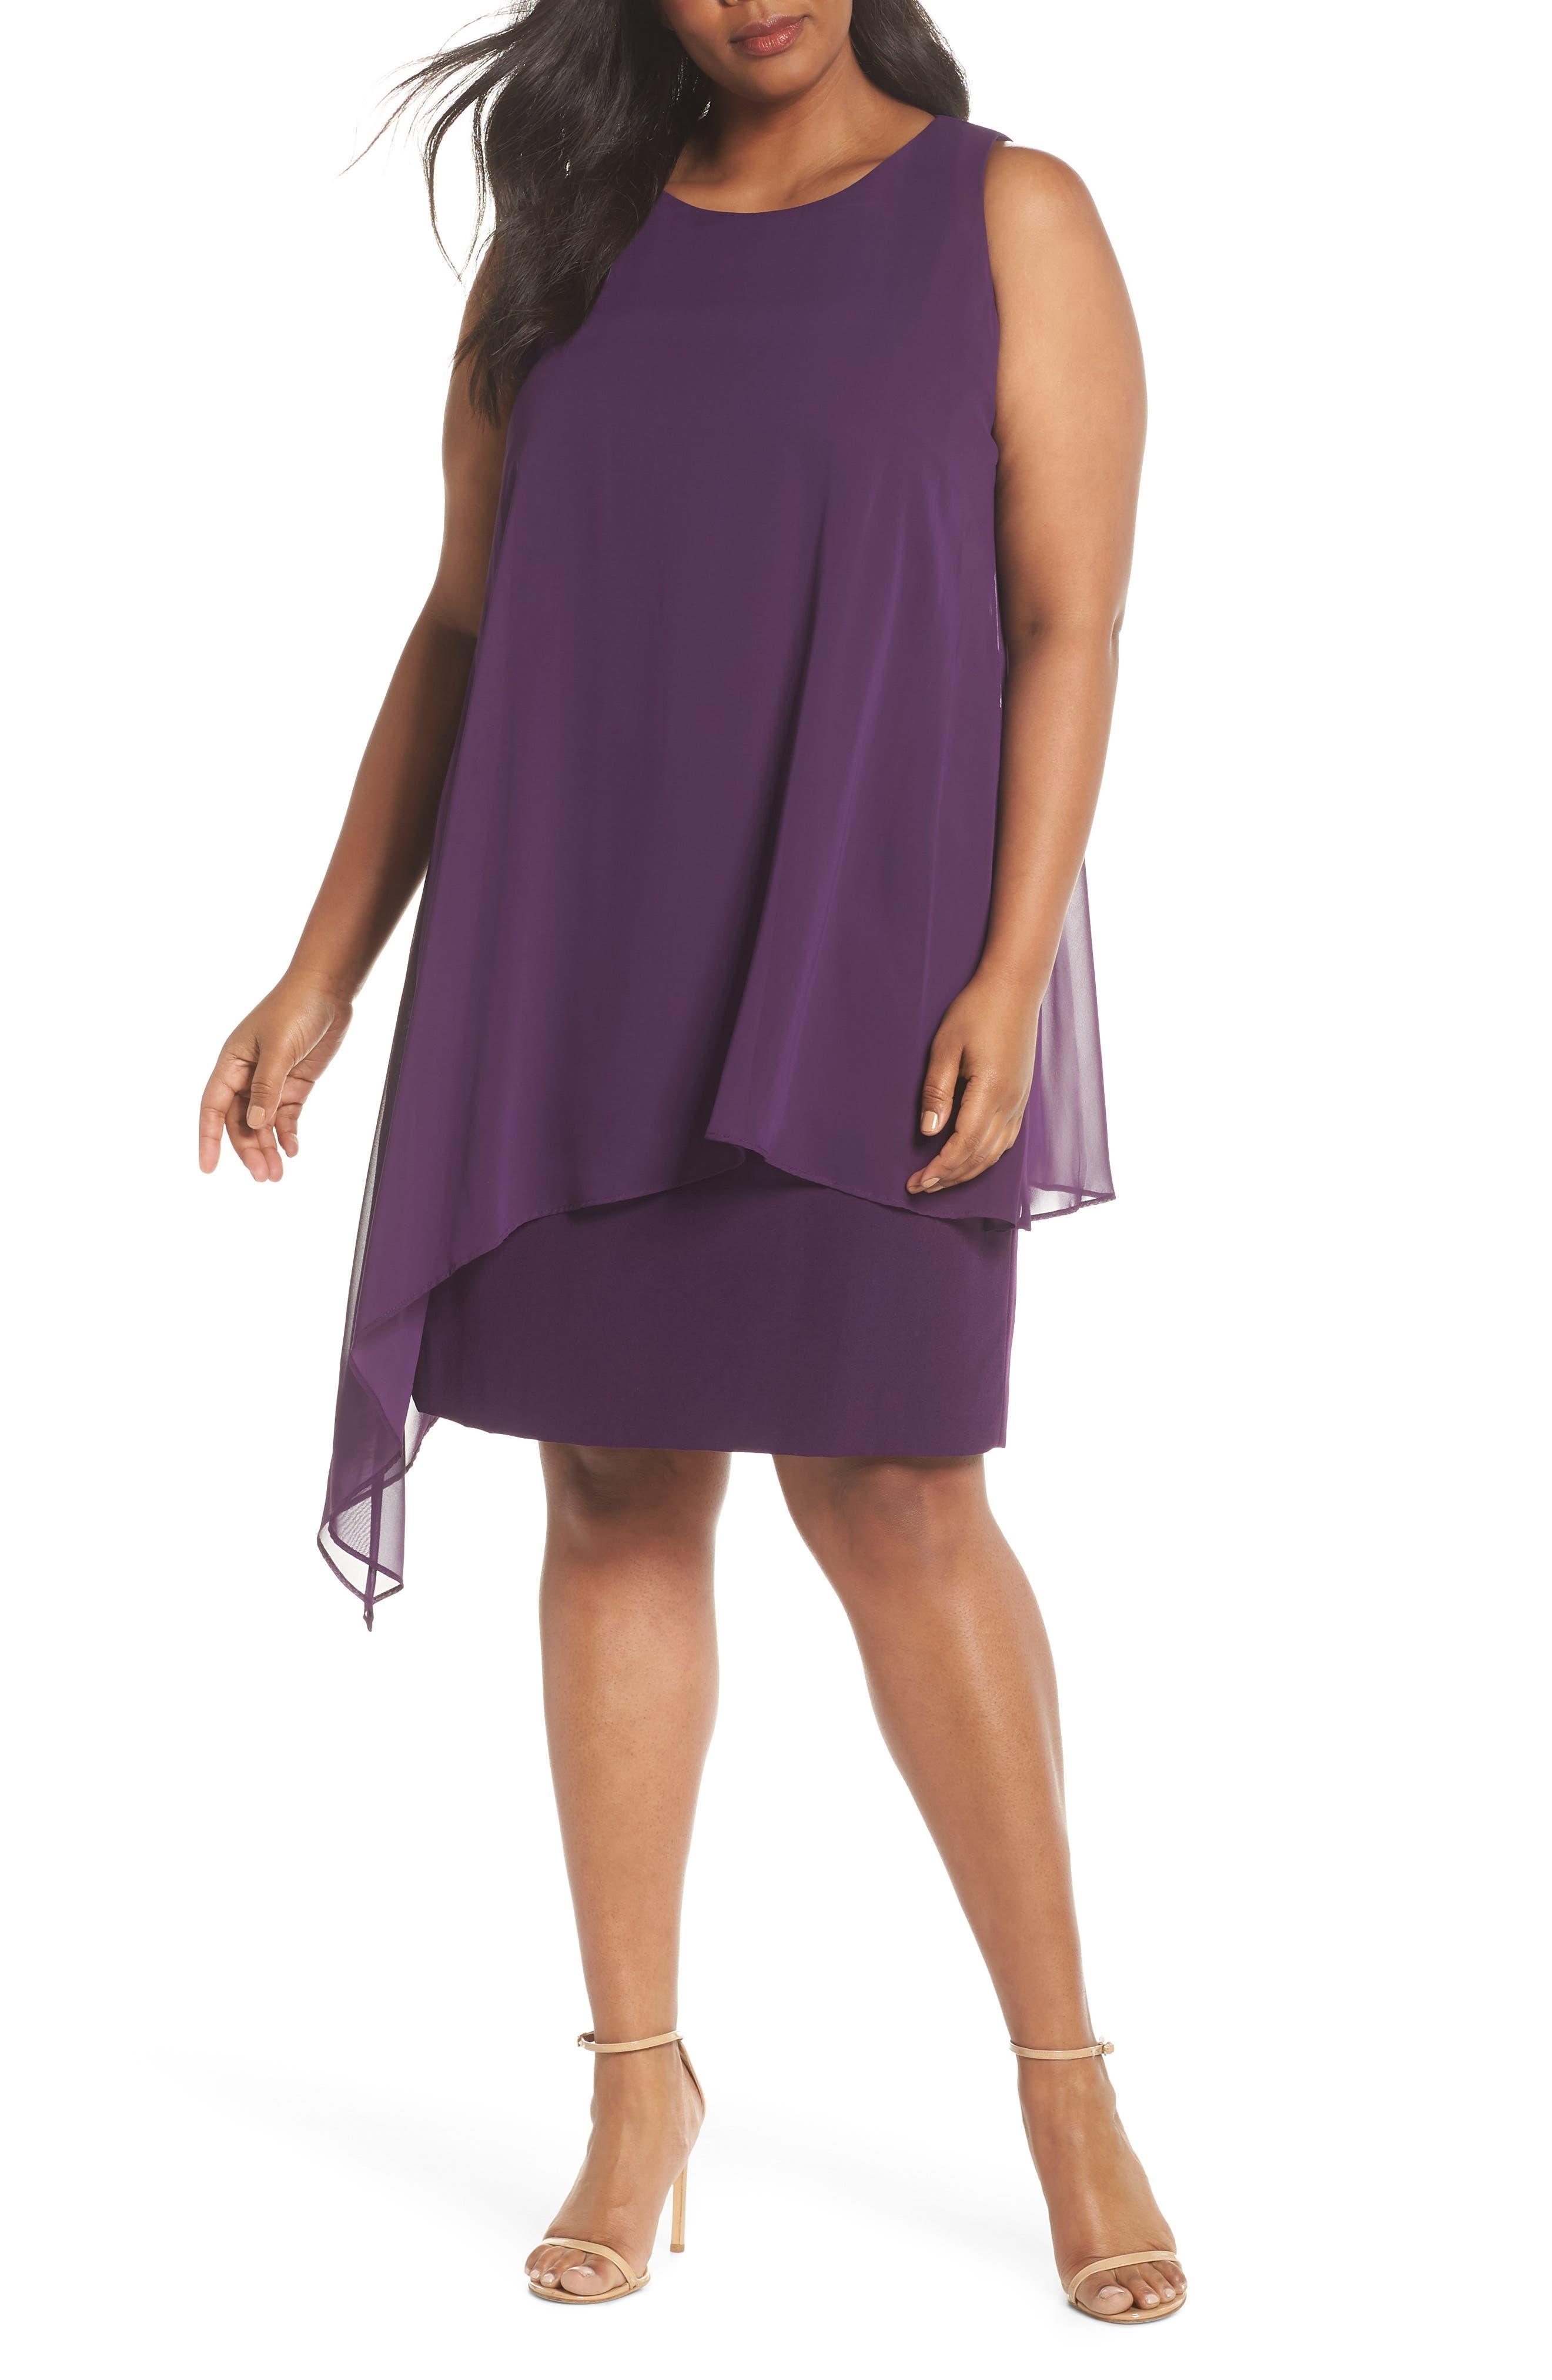 Tahari Chiffon Overlay Sheath Dress (Plus Size)